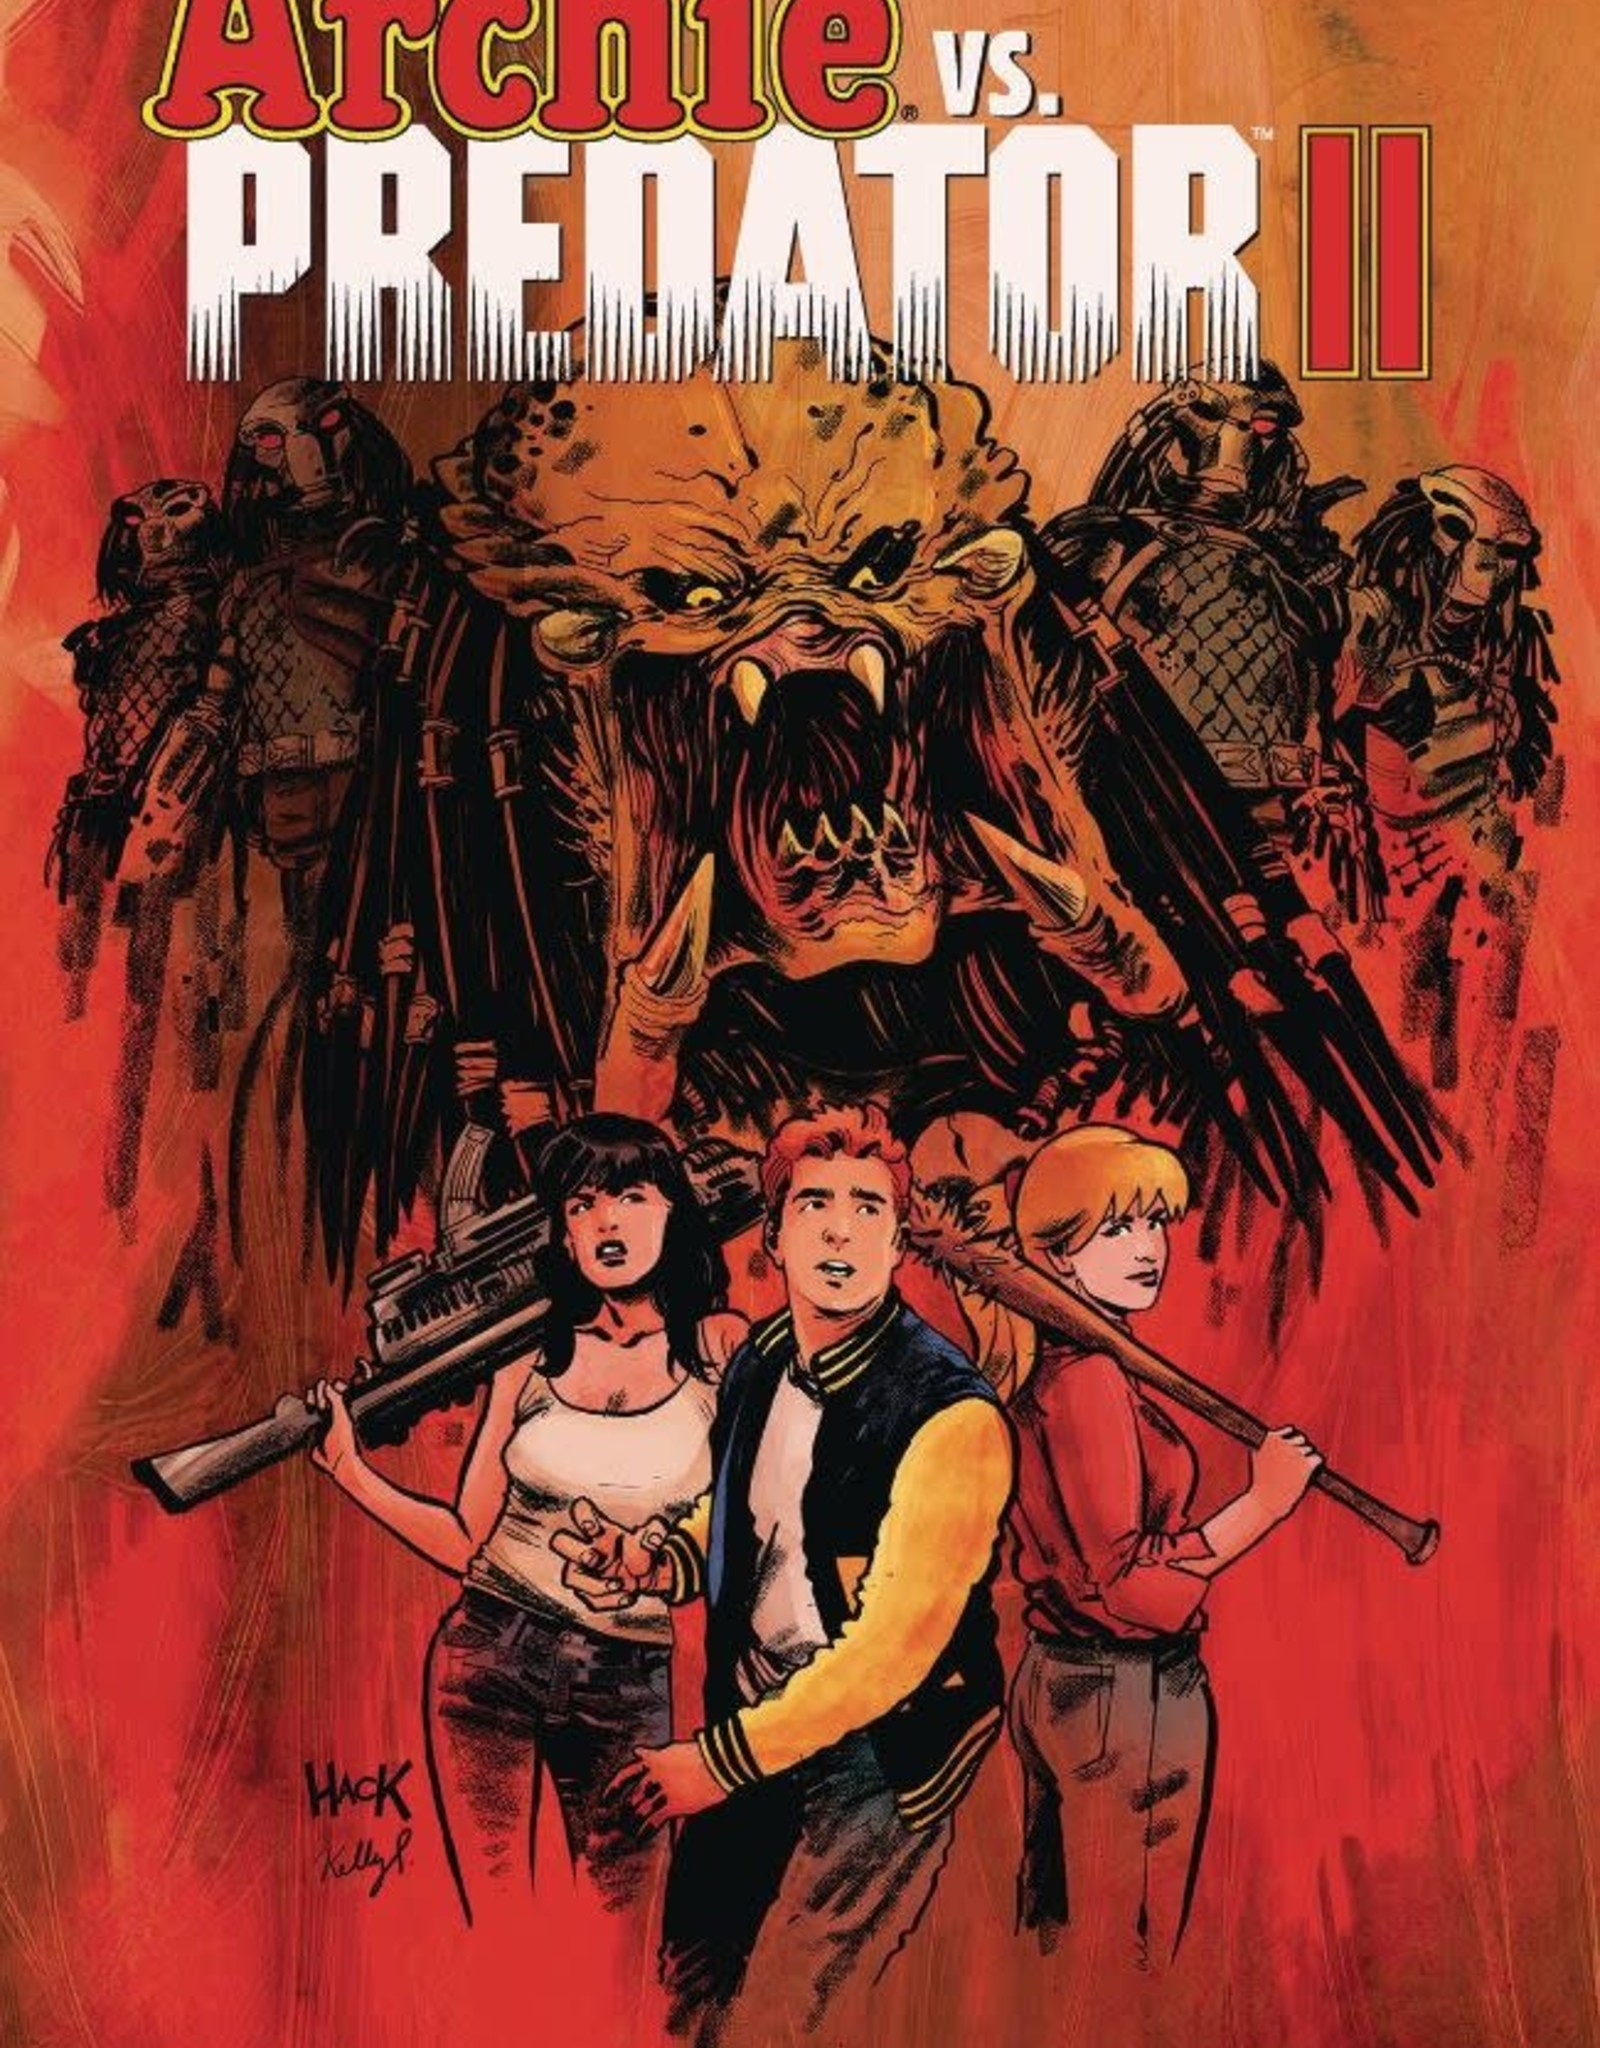 Archie Comics Archie vs. Predator II